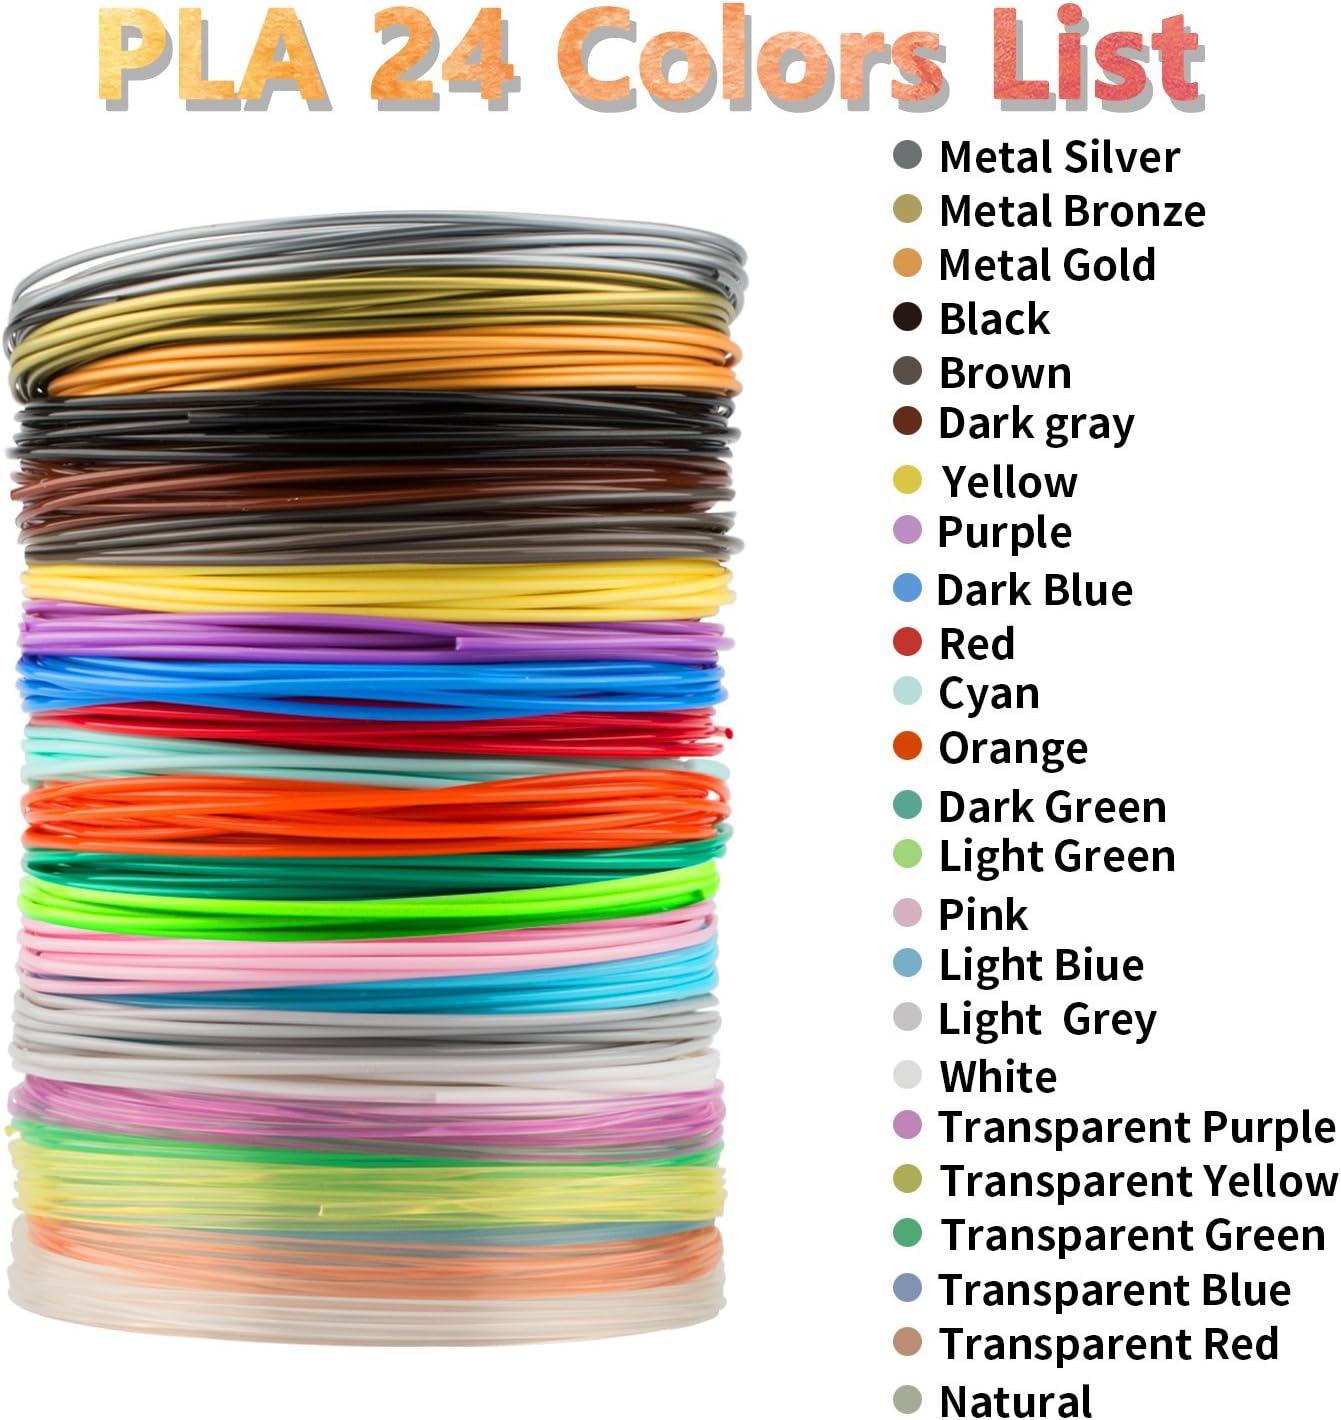 Filamento de 3D Pluma PLA 1,75 mm 15 colores 10m Material Ecol/ógico 3D Filamento para Pluma de Impresi/ón 3D Regalos para Ni/ños